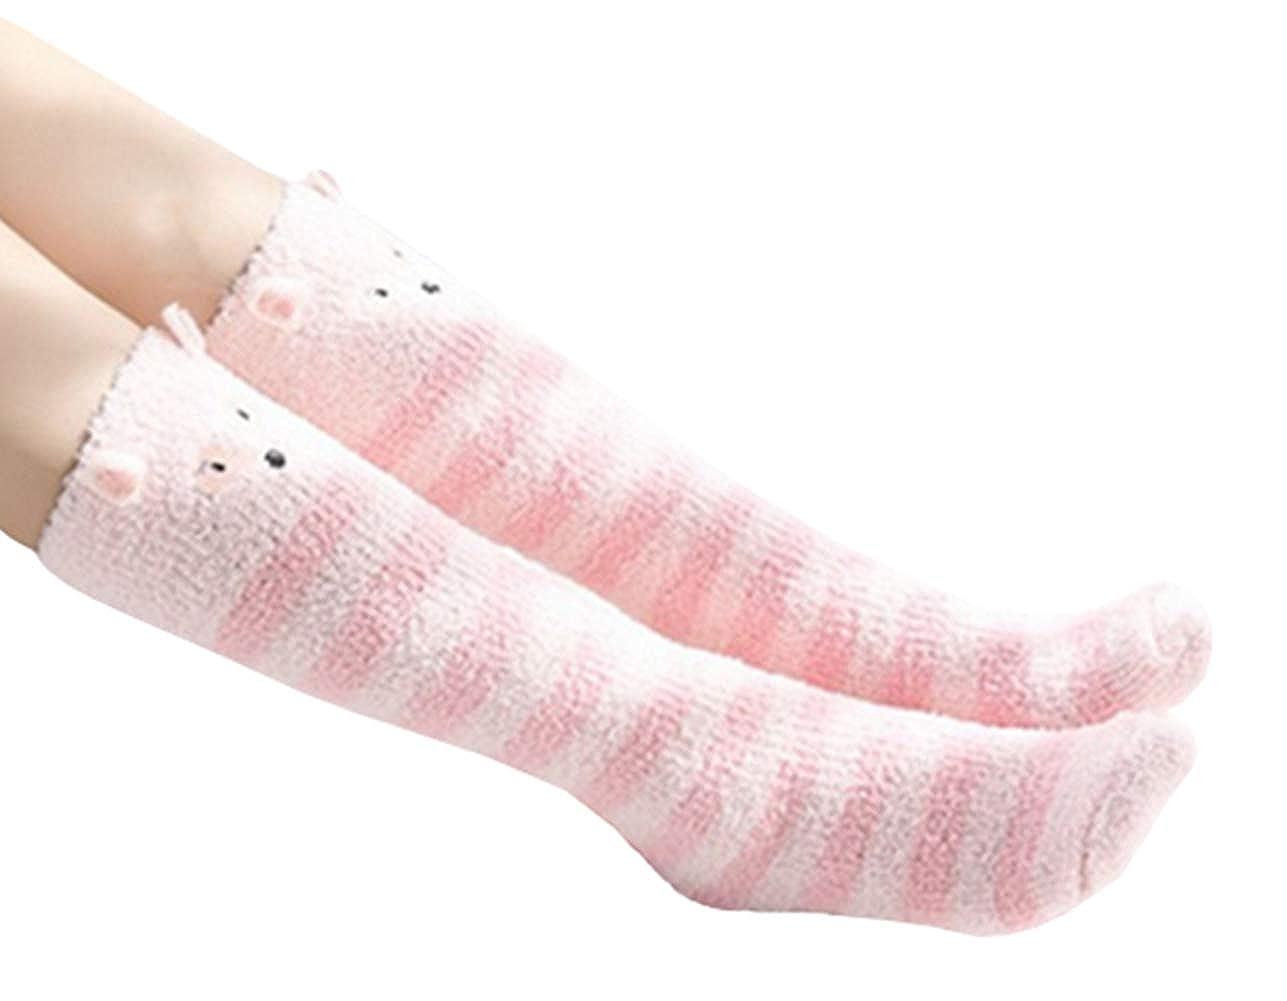 VISGOGO Baby Kids /& Adult Anti-Slip Knee High Long Socks Cute Animal Stockings